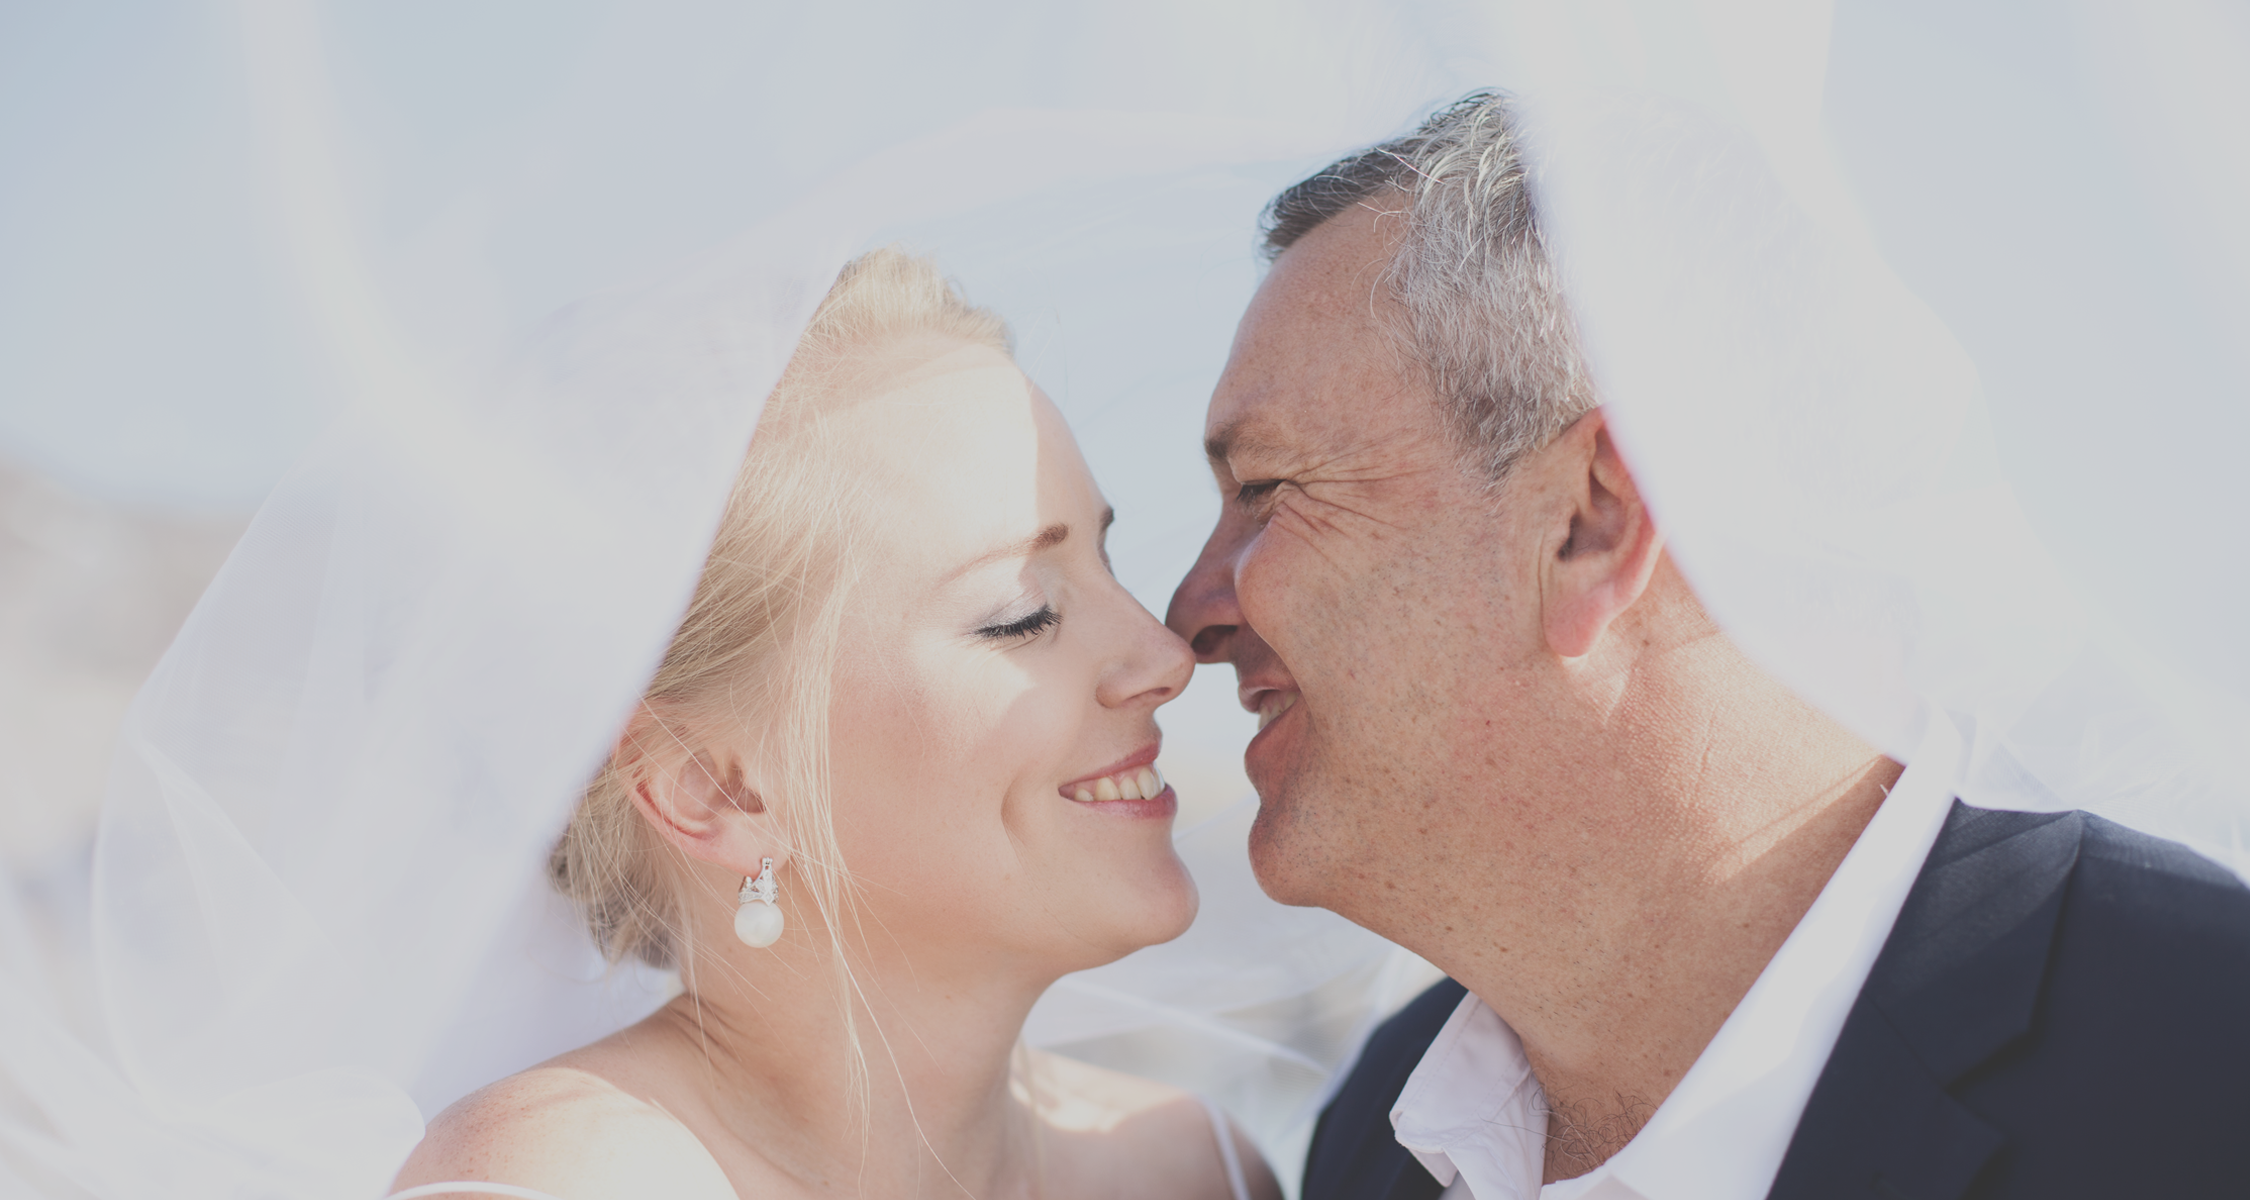 Wilma-Kotze-Photography-Altus-Dorinda-Wedding0019